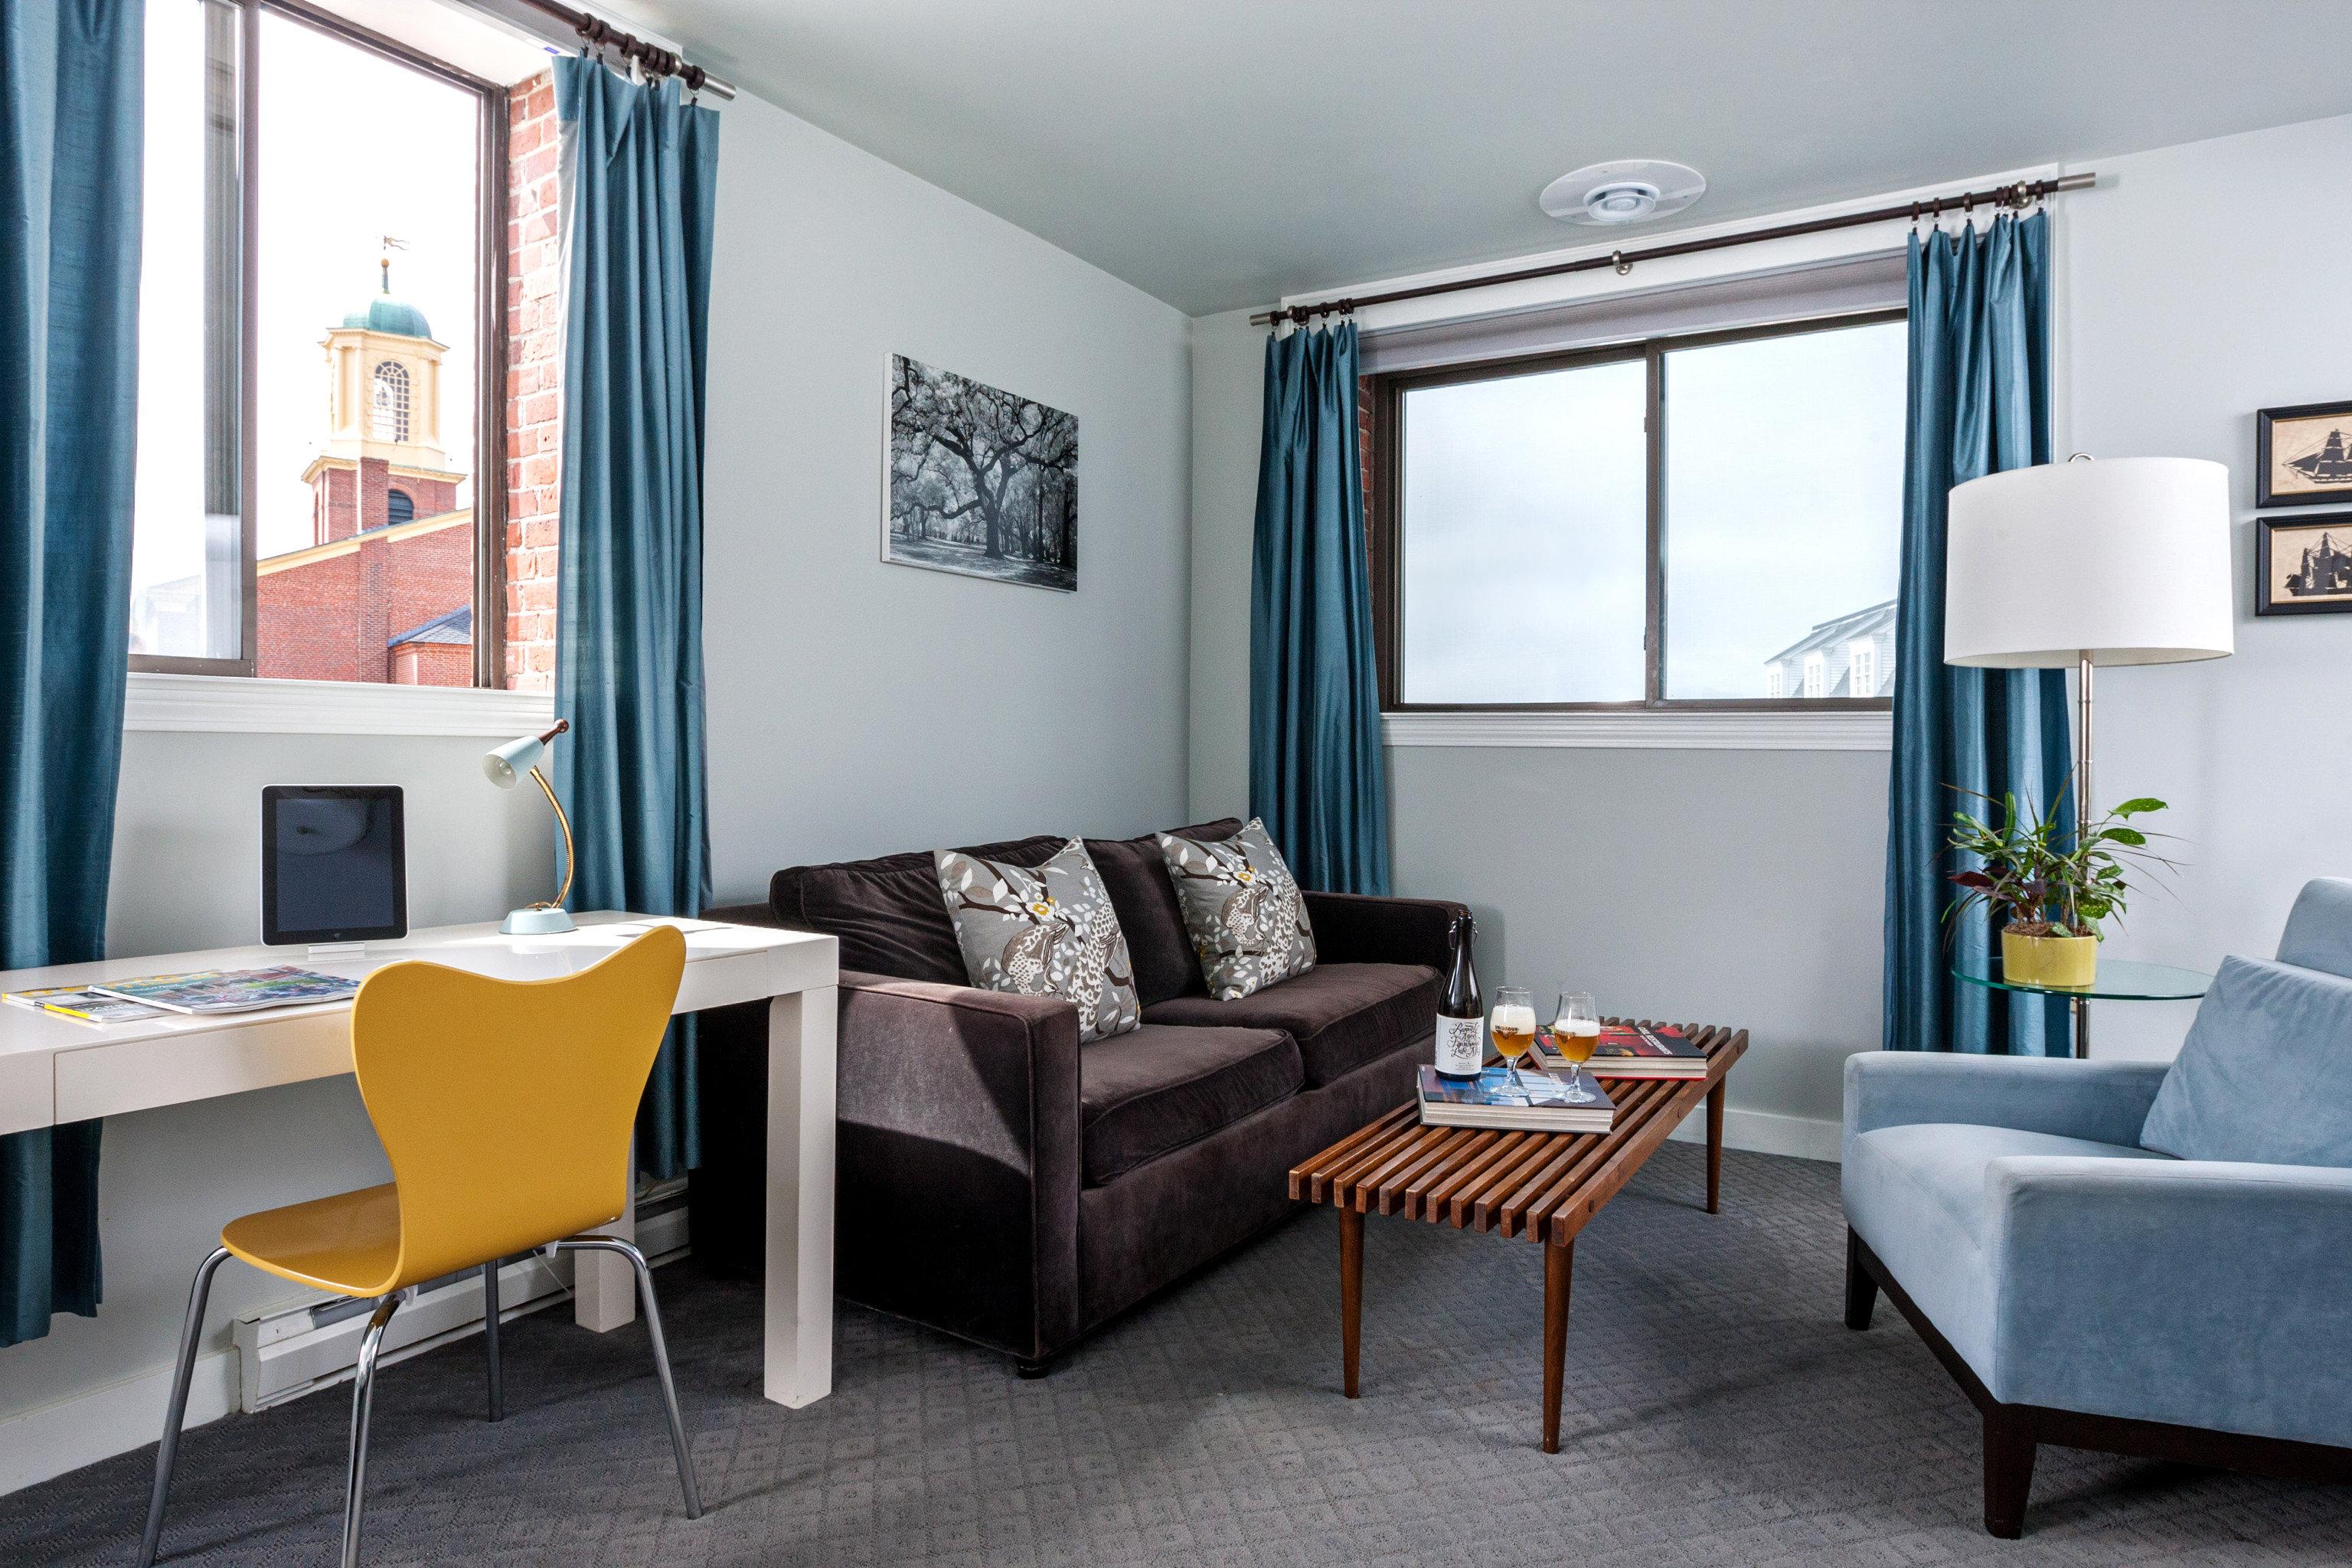 Boutique City Hip Inn living room chair property condominium home Suite